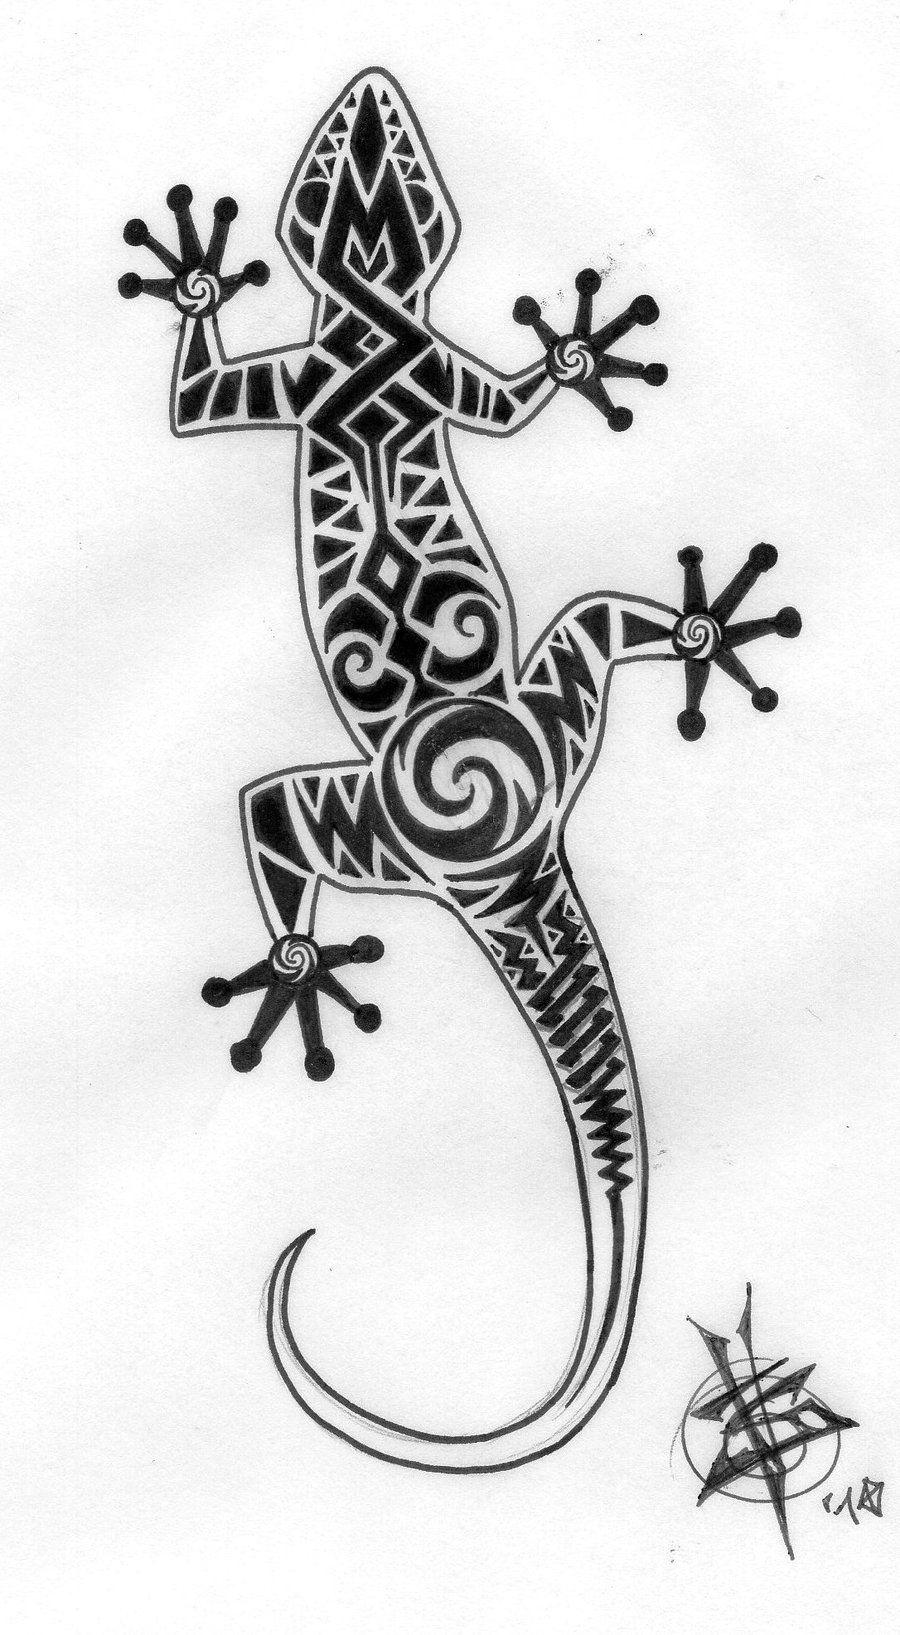 Lizard Tattoo Tribal Recherche Google Armband Tatoeage Tatoeage Ideeen Polynesische Tatoeages